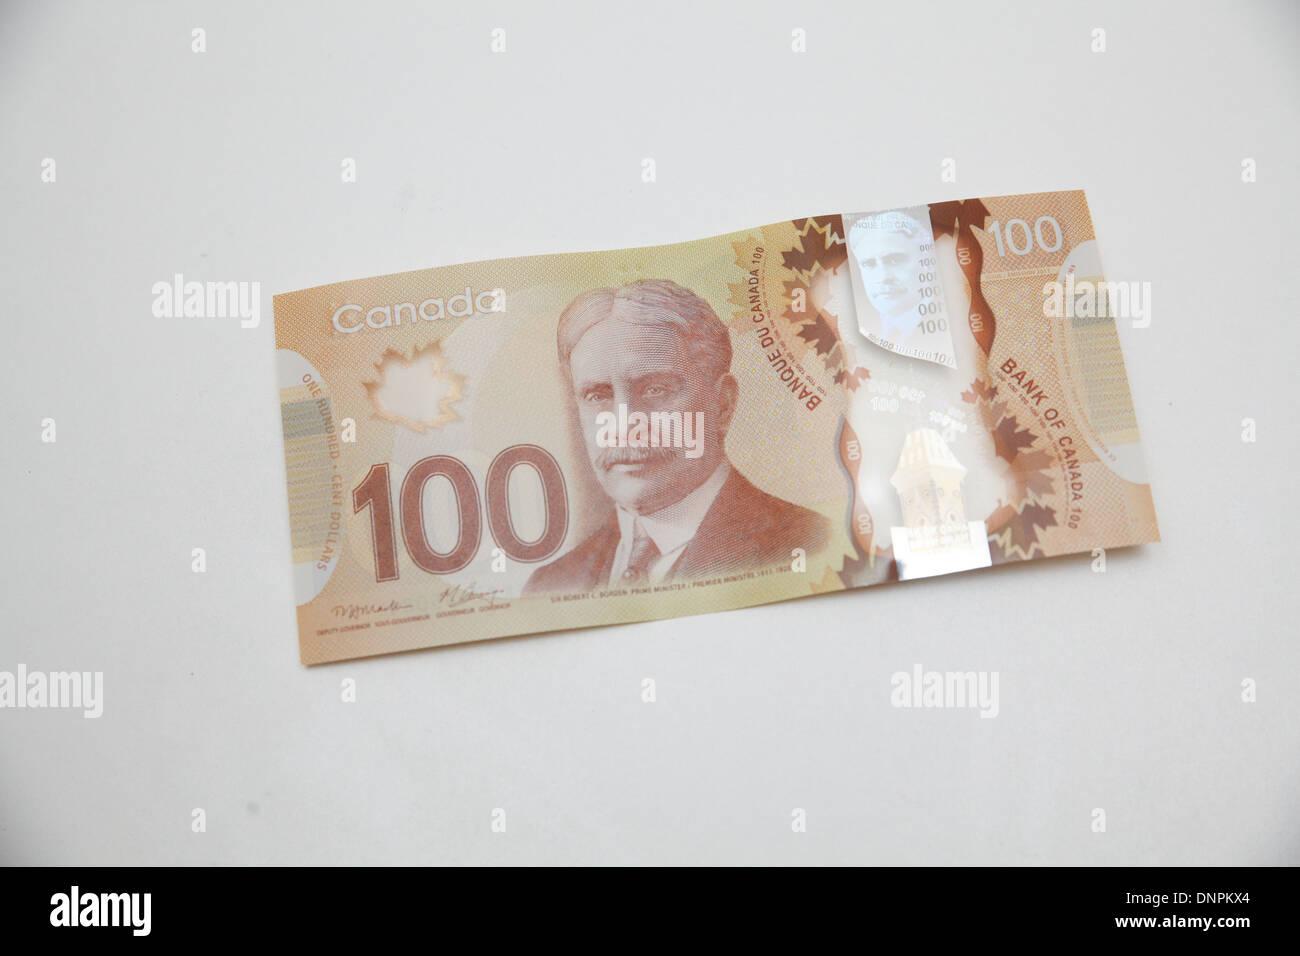 Hundred Dollar Note Stockfotos & Hundred Dollar Note Bilder - Alamy